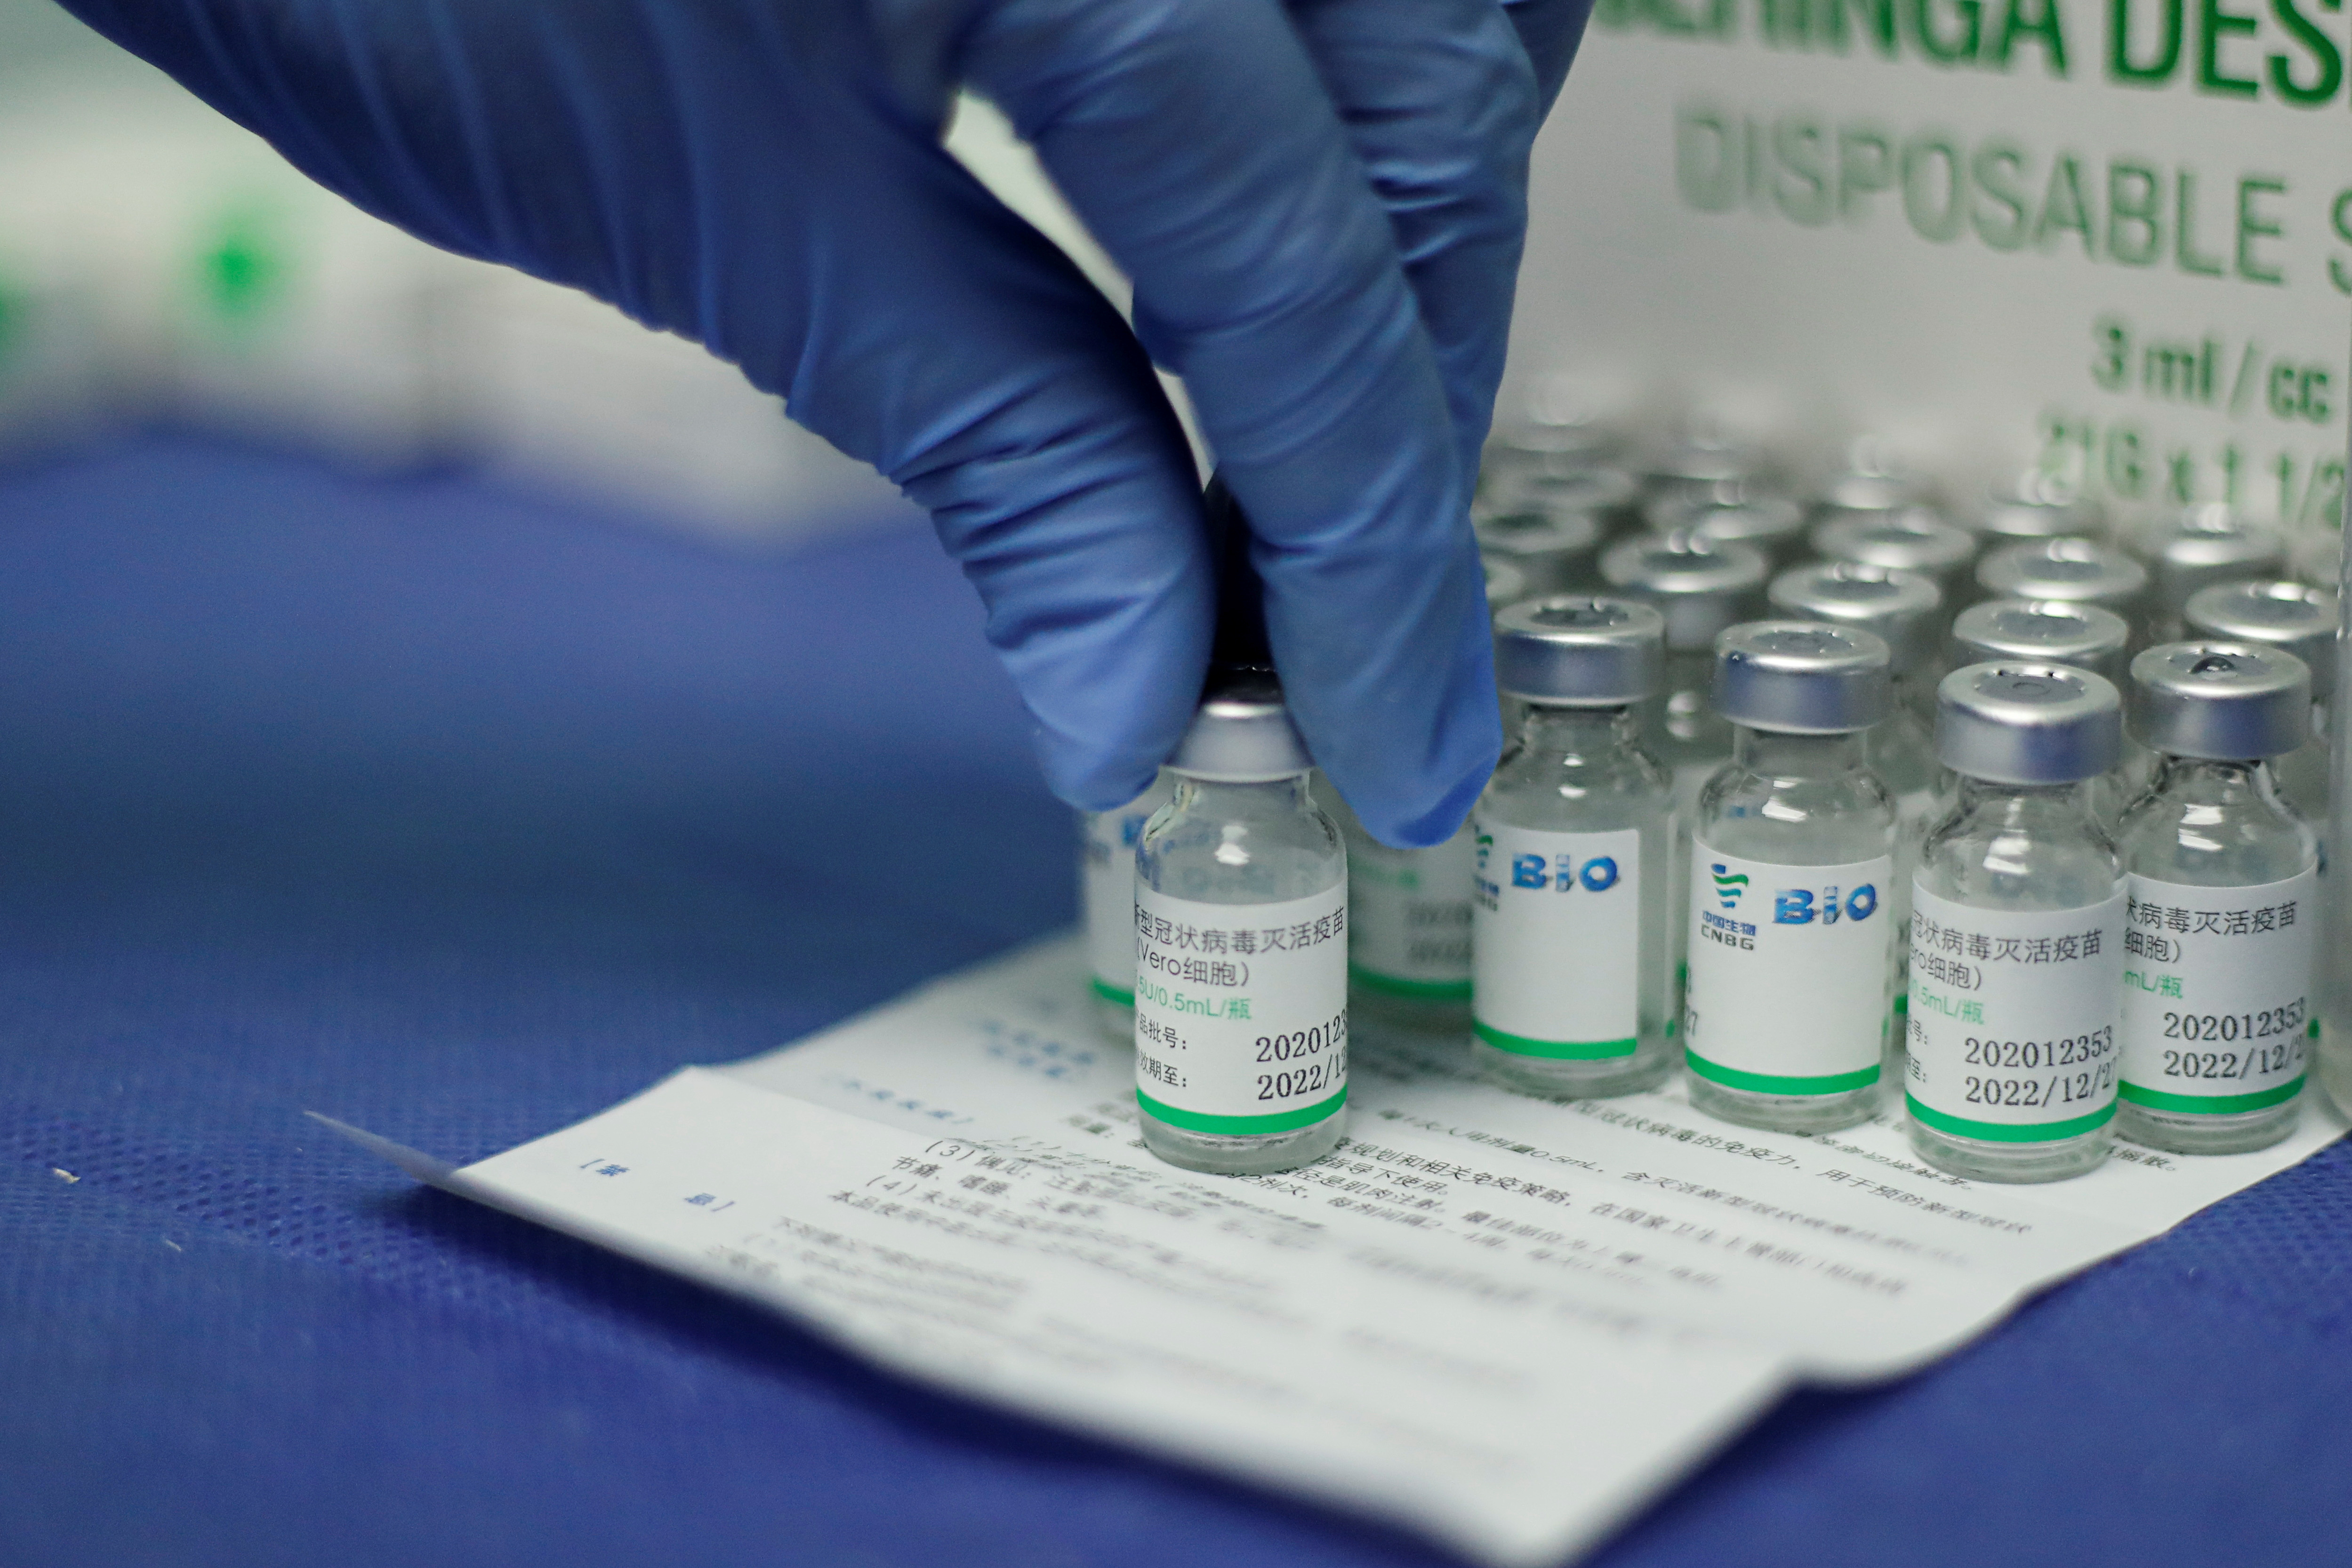 A nurse holds a vial of China's Sinopharm coronavirus disease (COVID-19) vaccine at a health center in Caracas, Venezuela March 7, 2021. REUTERS/Leonardo Fernandez Viloria